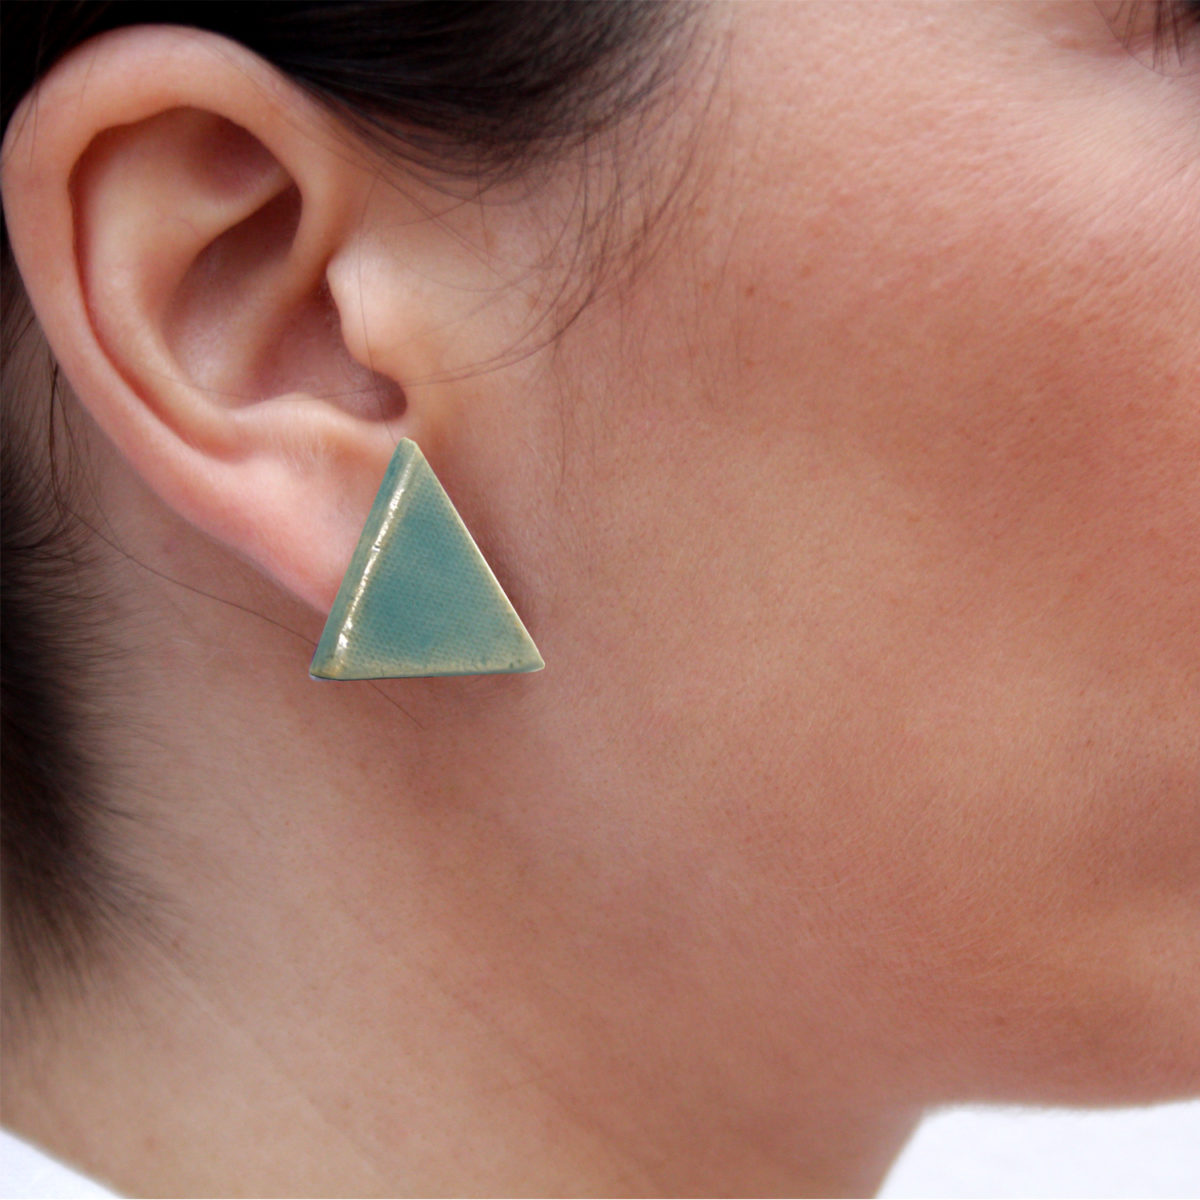 Pendientes de cerámica triangulares hechos a mano color verde agua Fuente Bowtery minimalista. Minimalist handmade ceramic triangle earrings water blue green